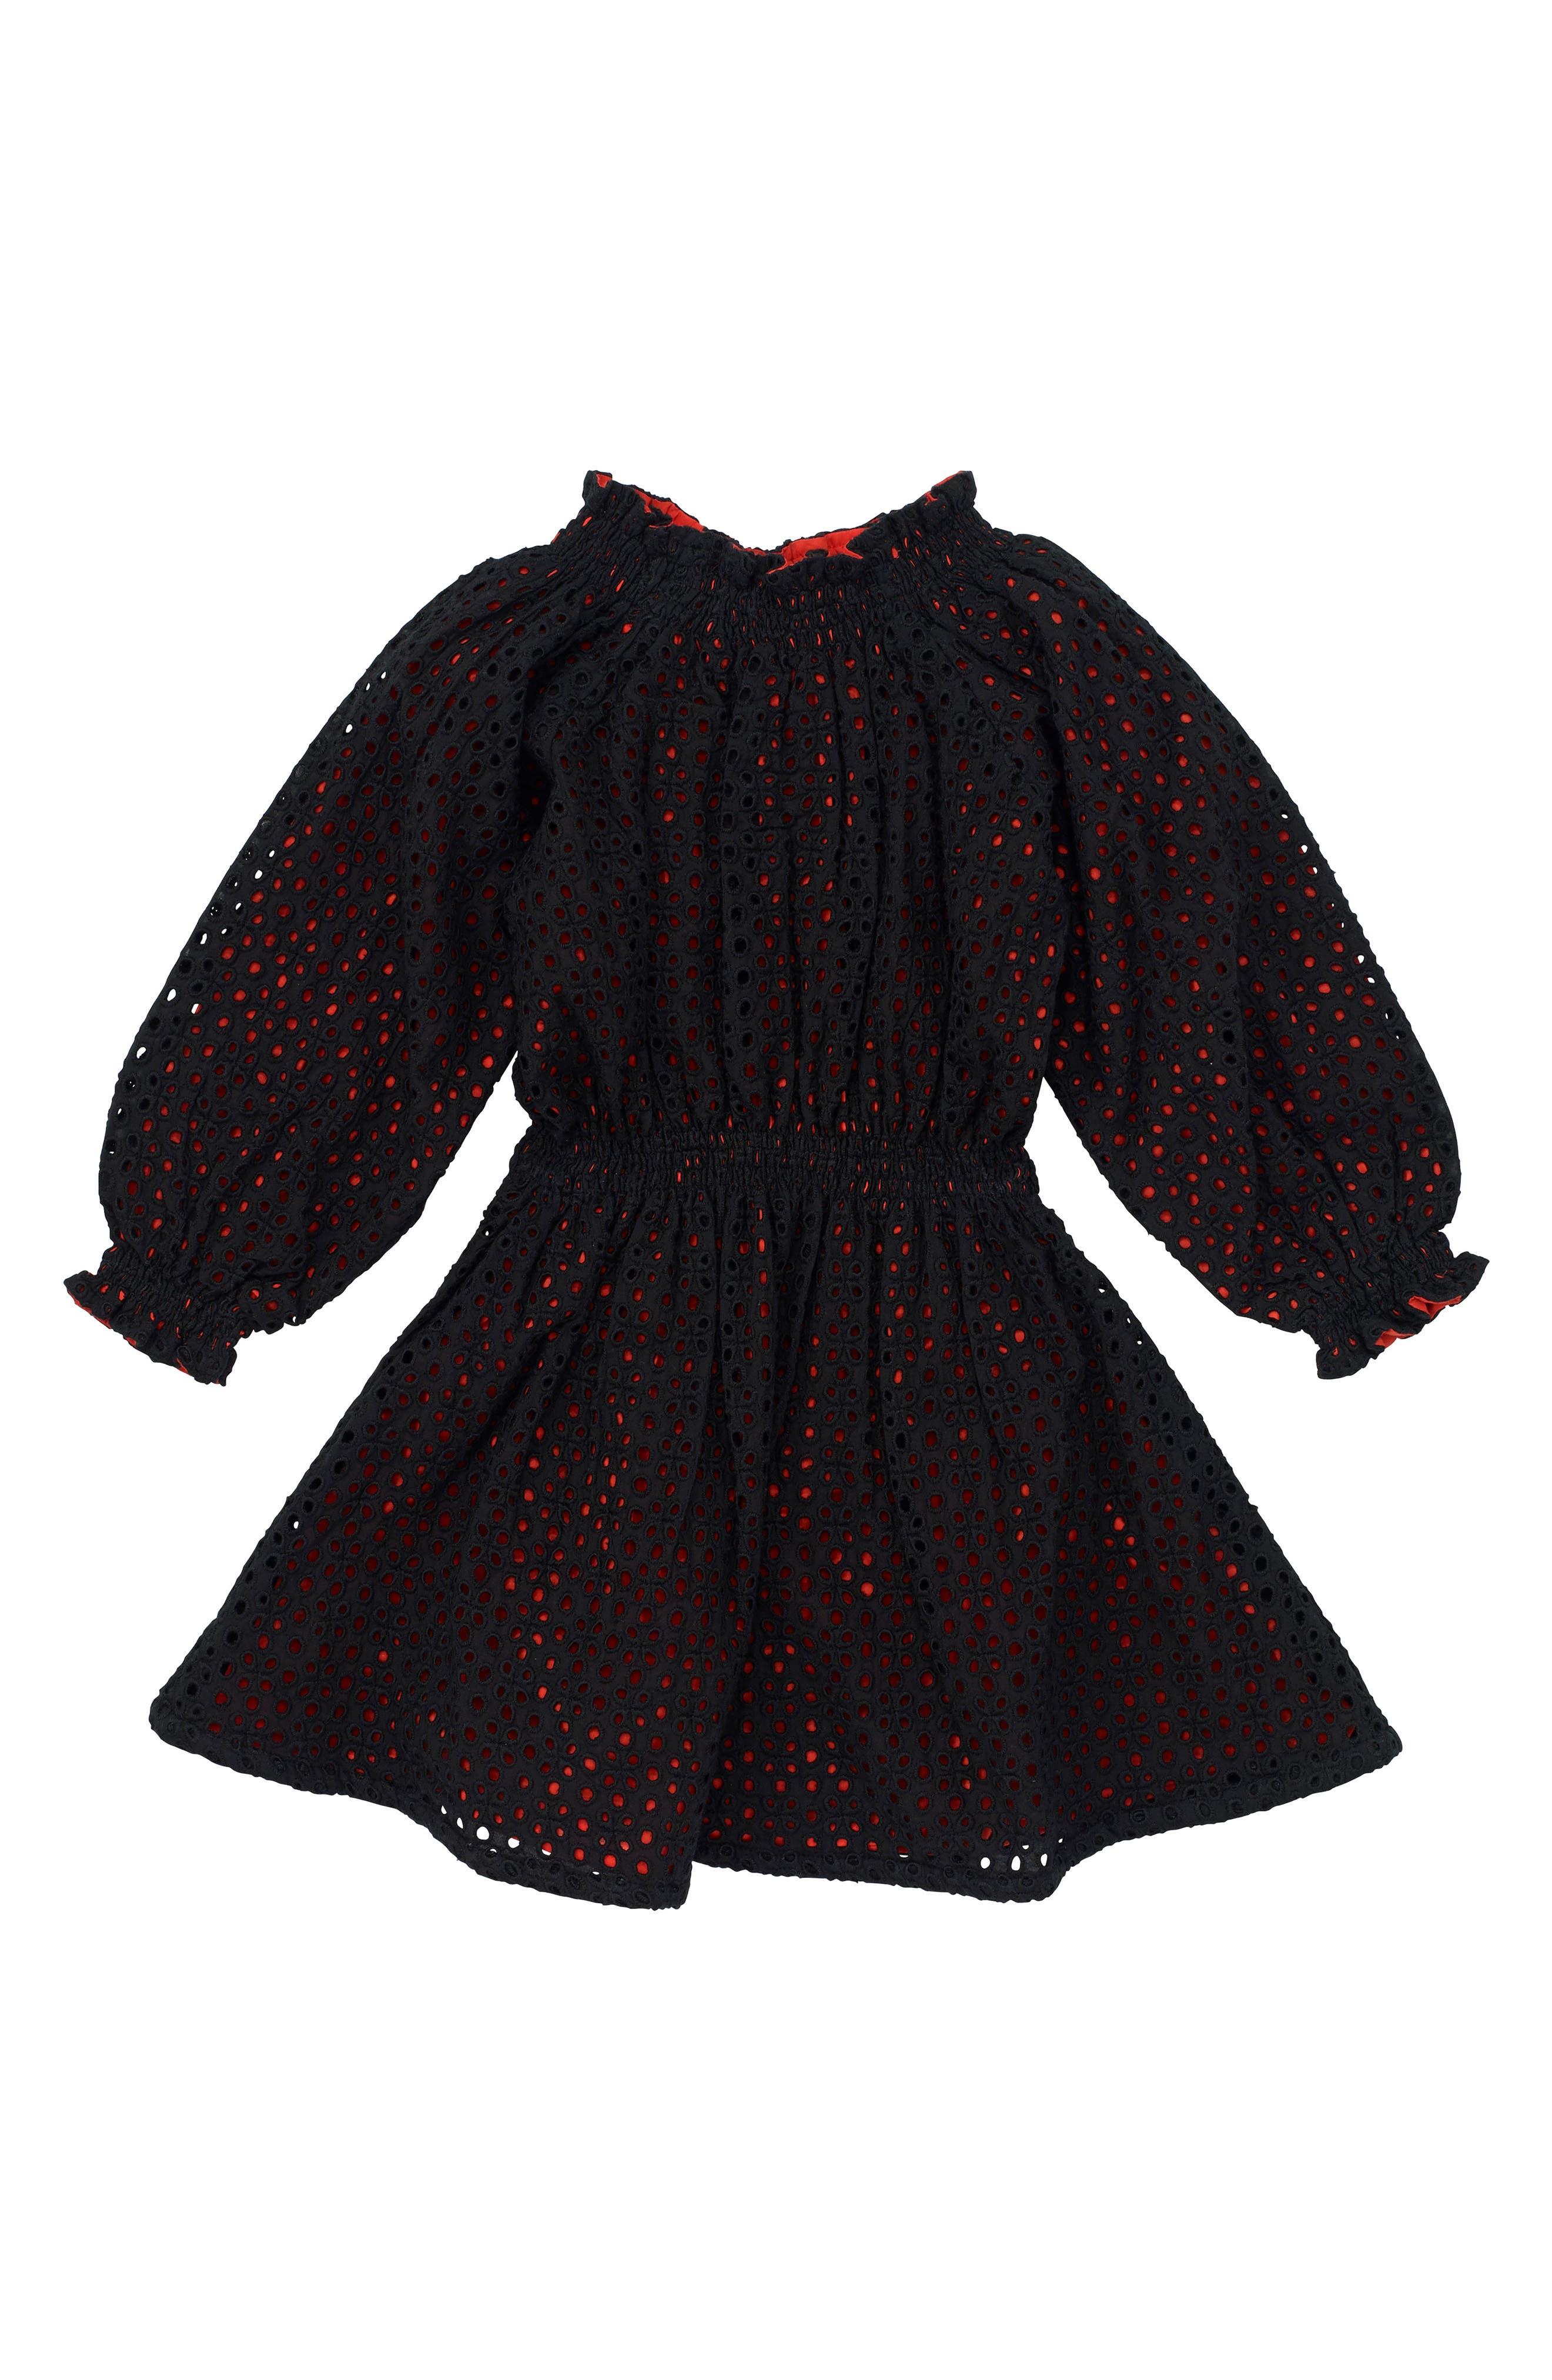 Black dress 4t robe